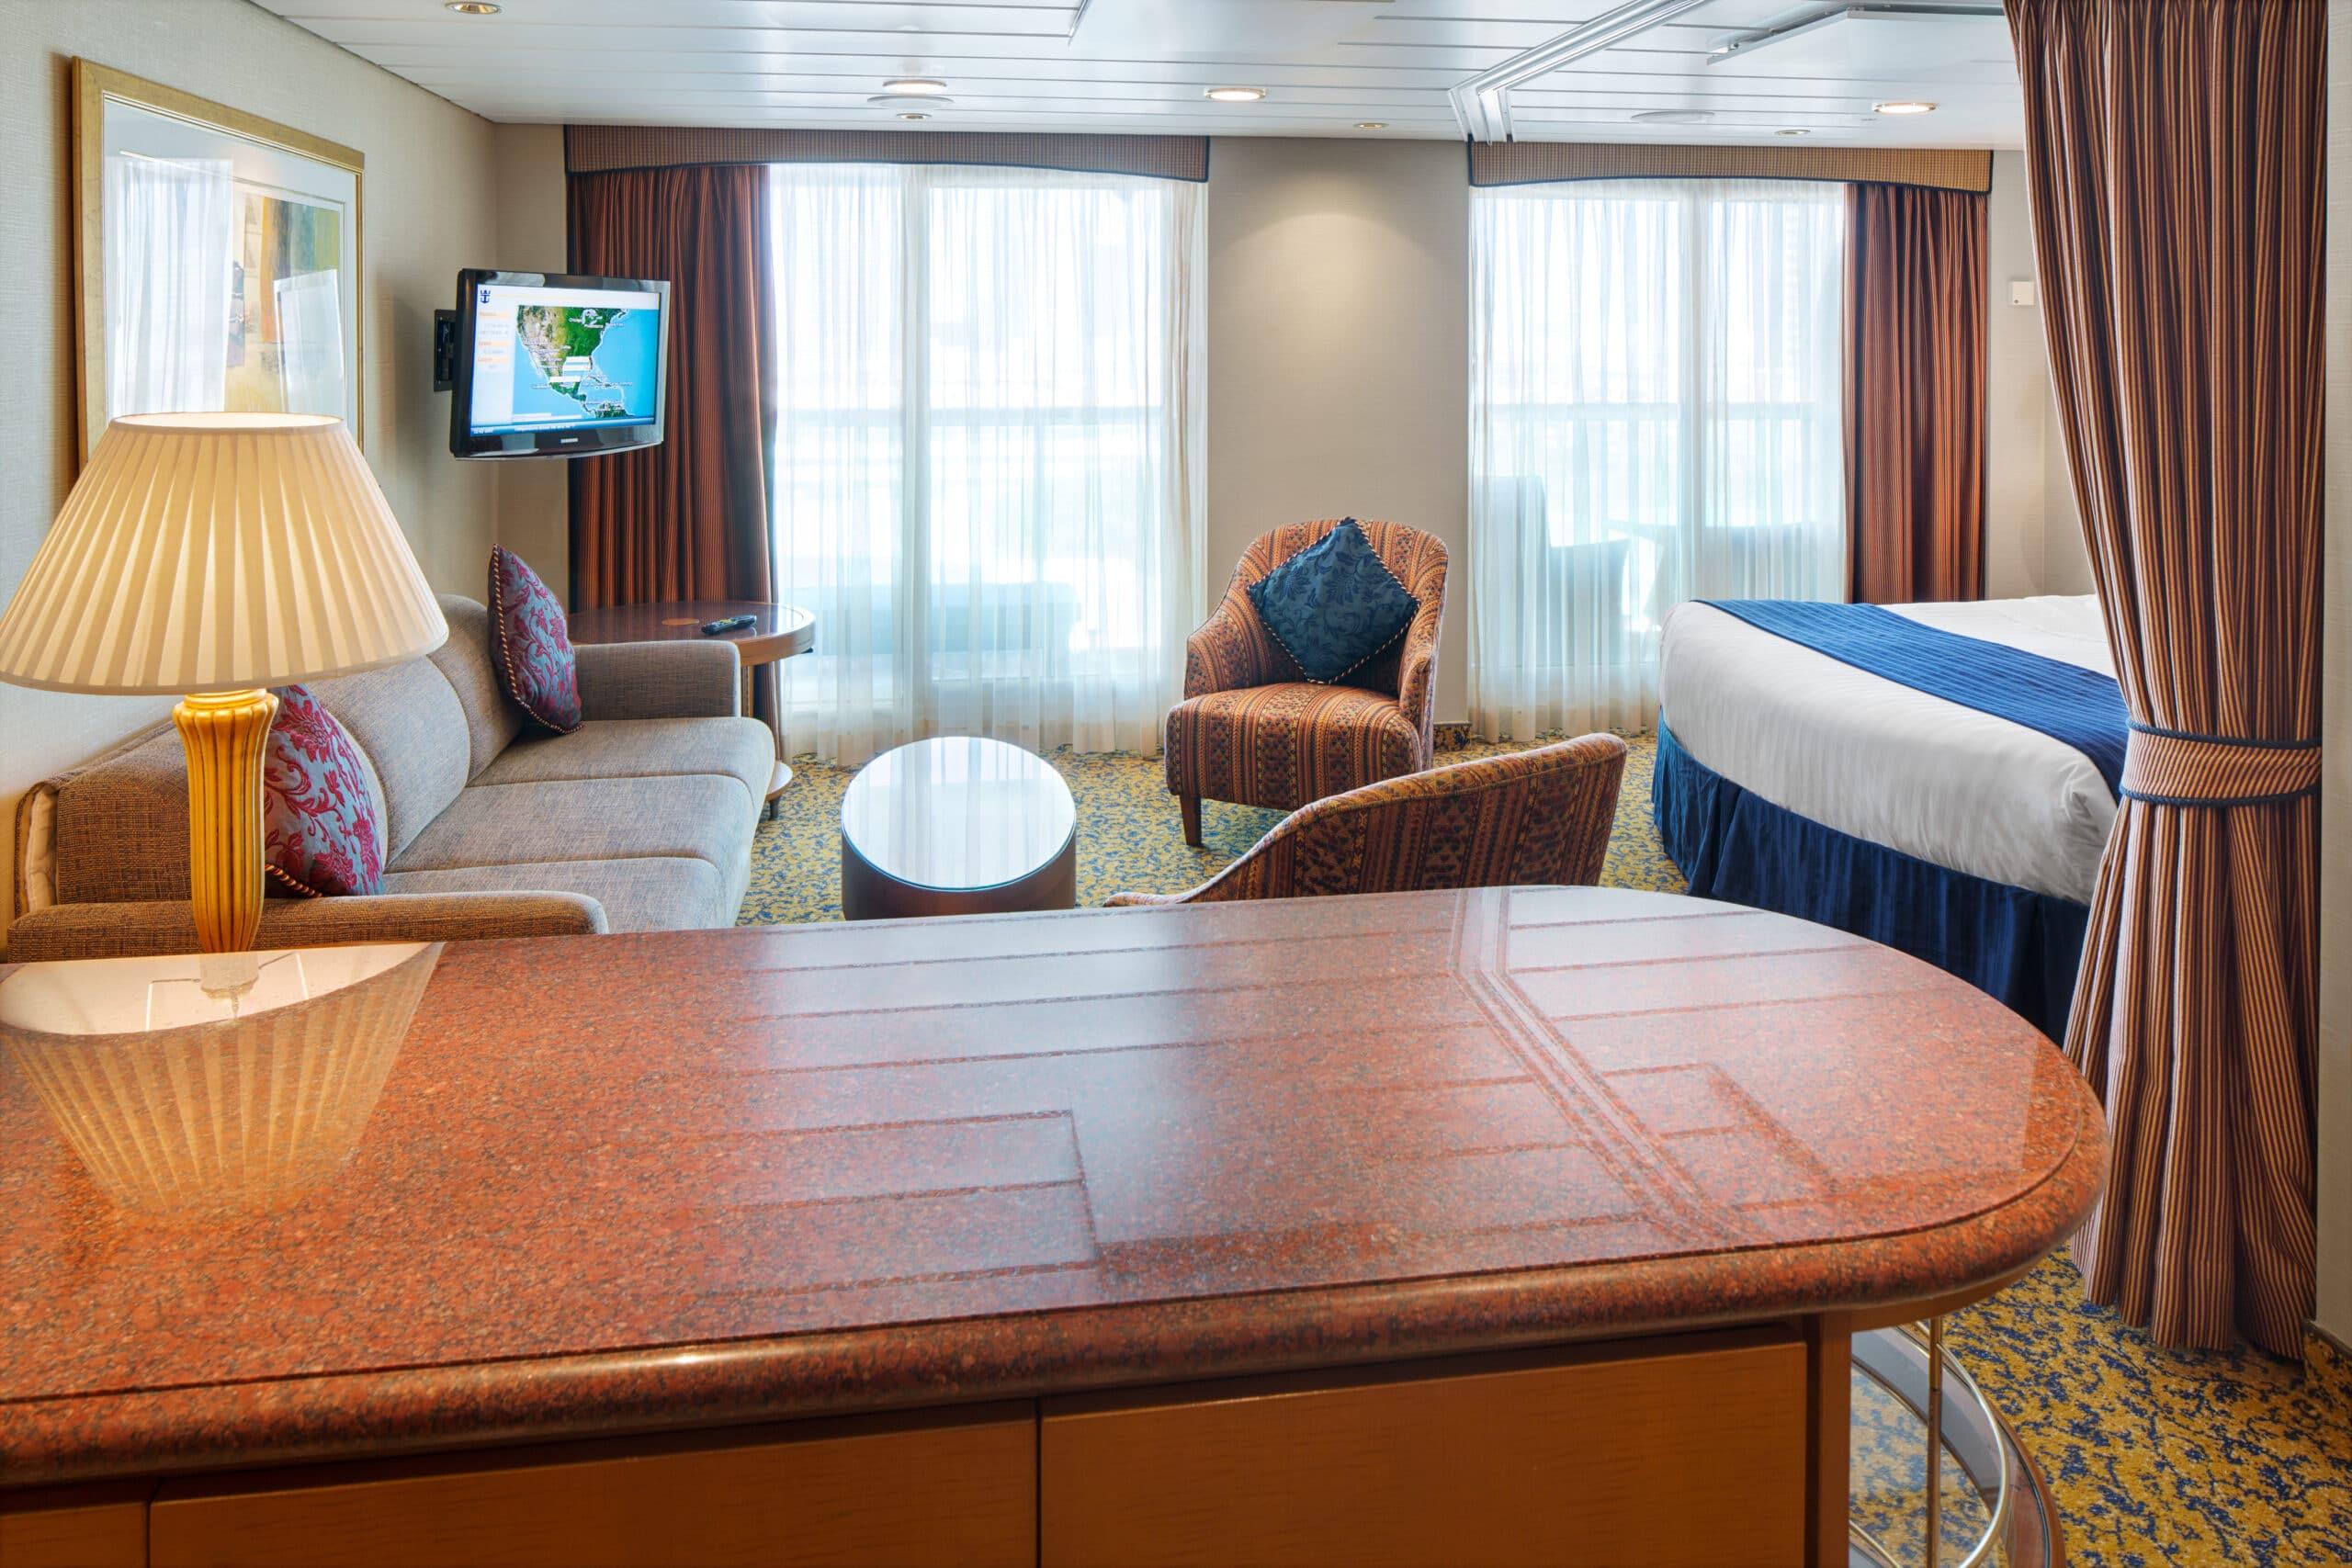 Royal-Caribbean-International-Brilliance-of-the-Seas-schip-cruiseschip-categorie-GS-Grand-Suite